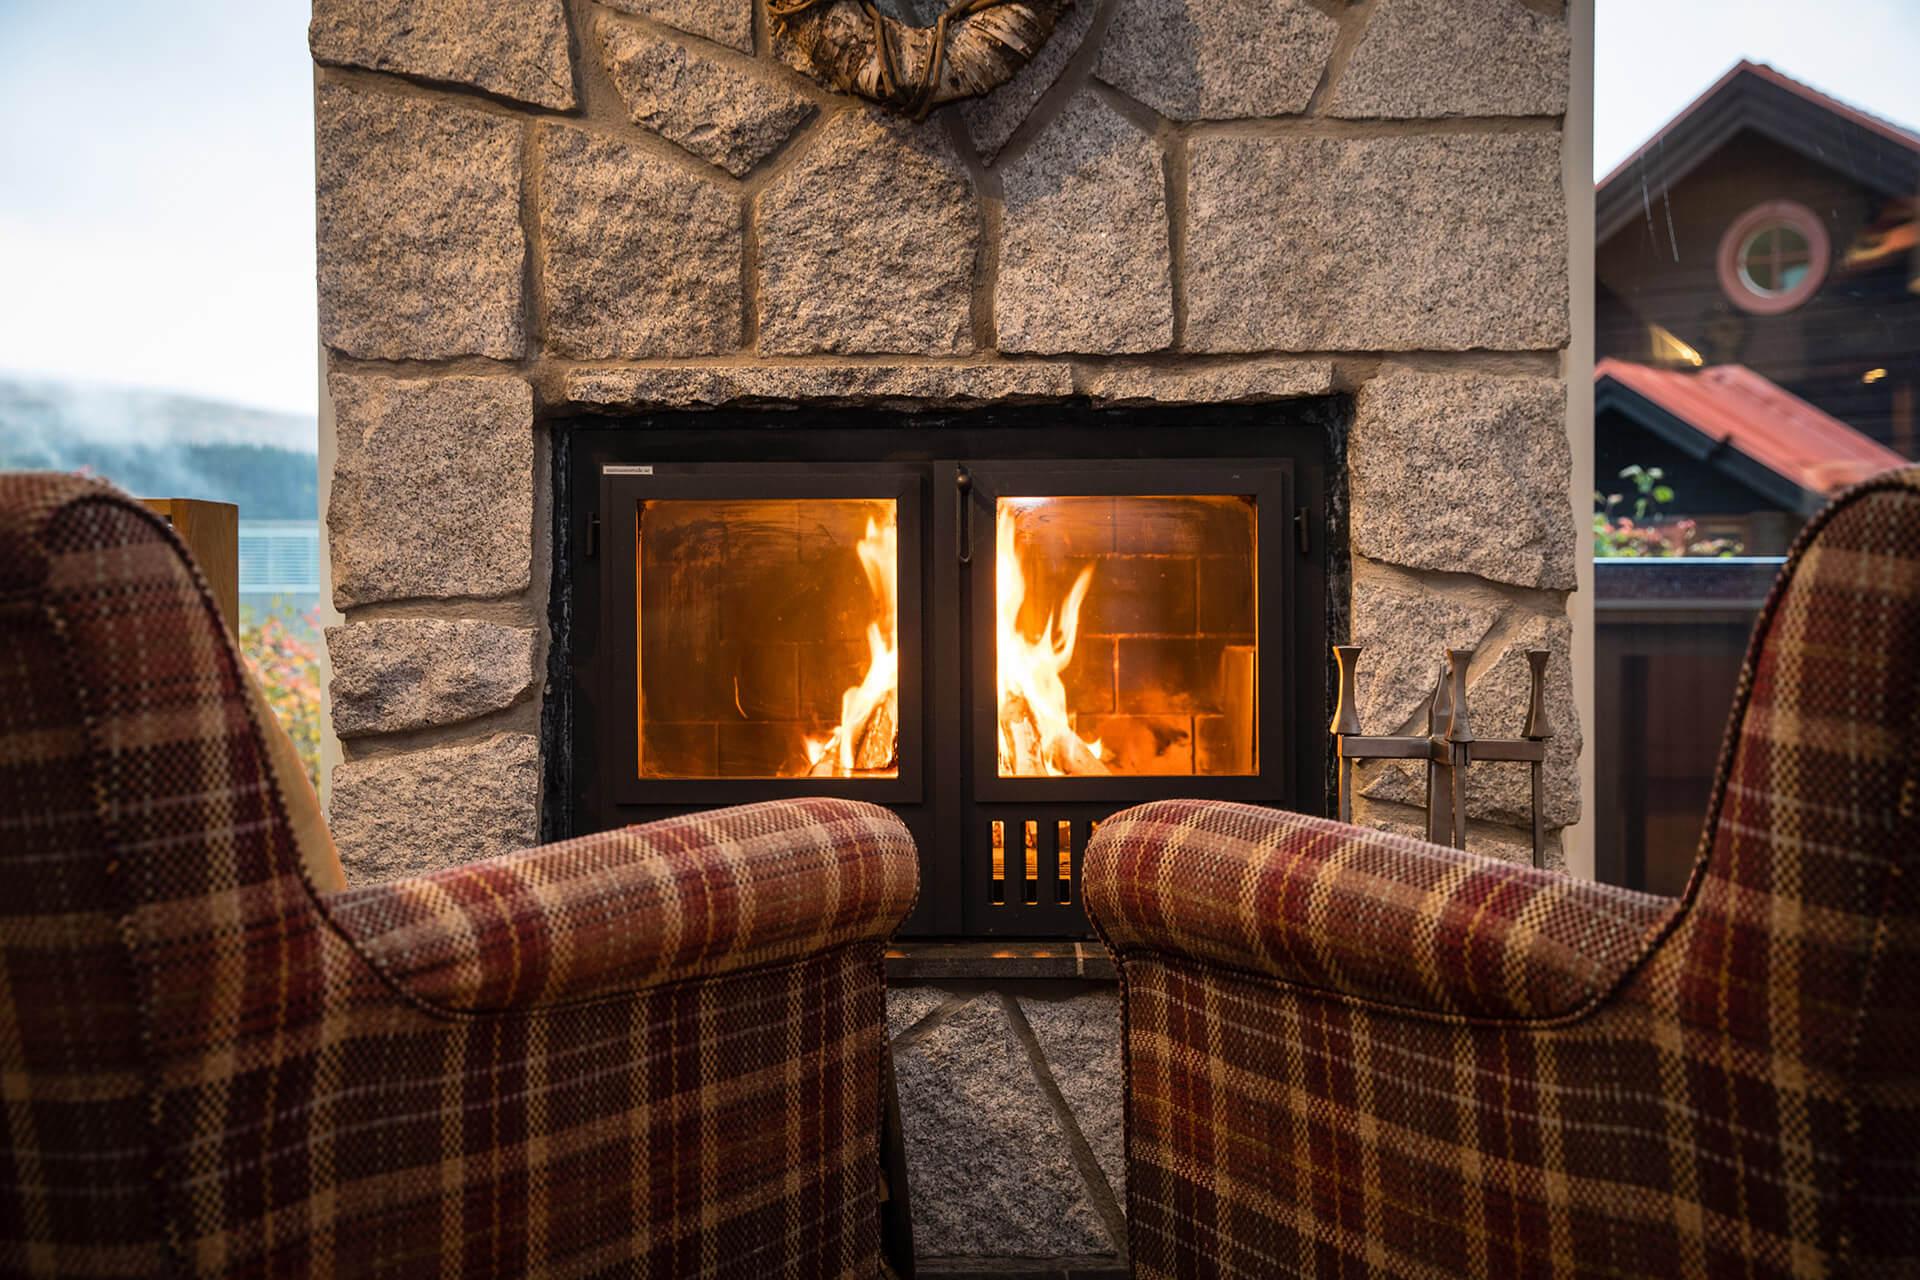 Boende-Åre-Tottbacken-Åre Travel-fireplace-4-bäddar